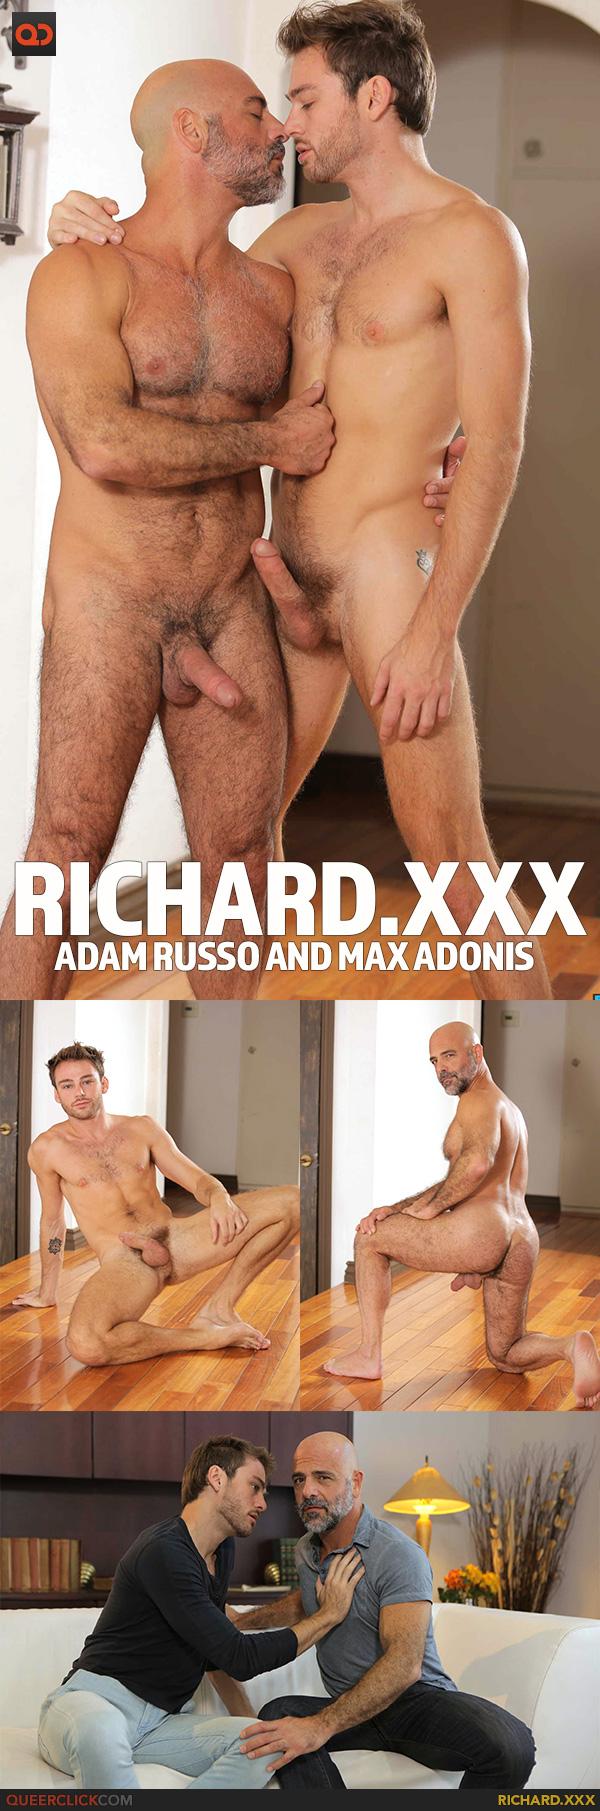 Richard.XXX:  Adam Russo and Max Adonis